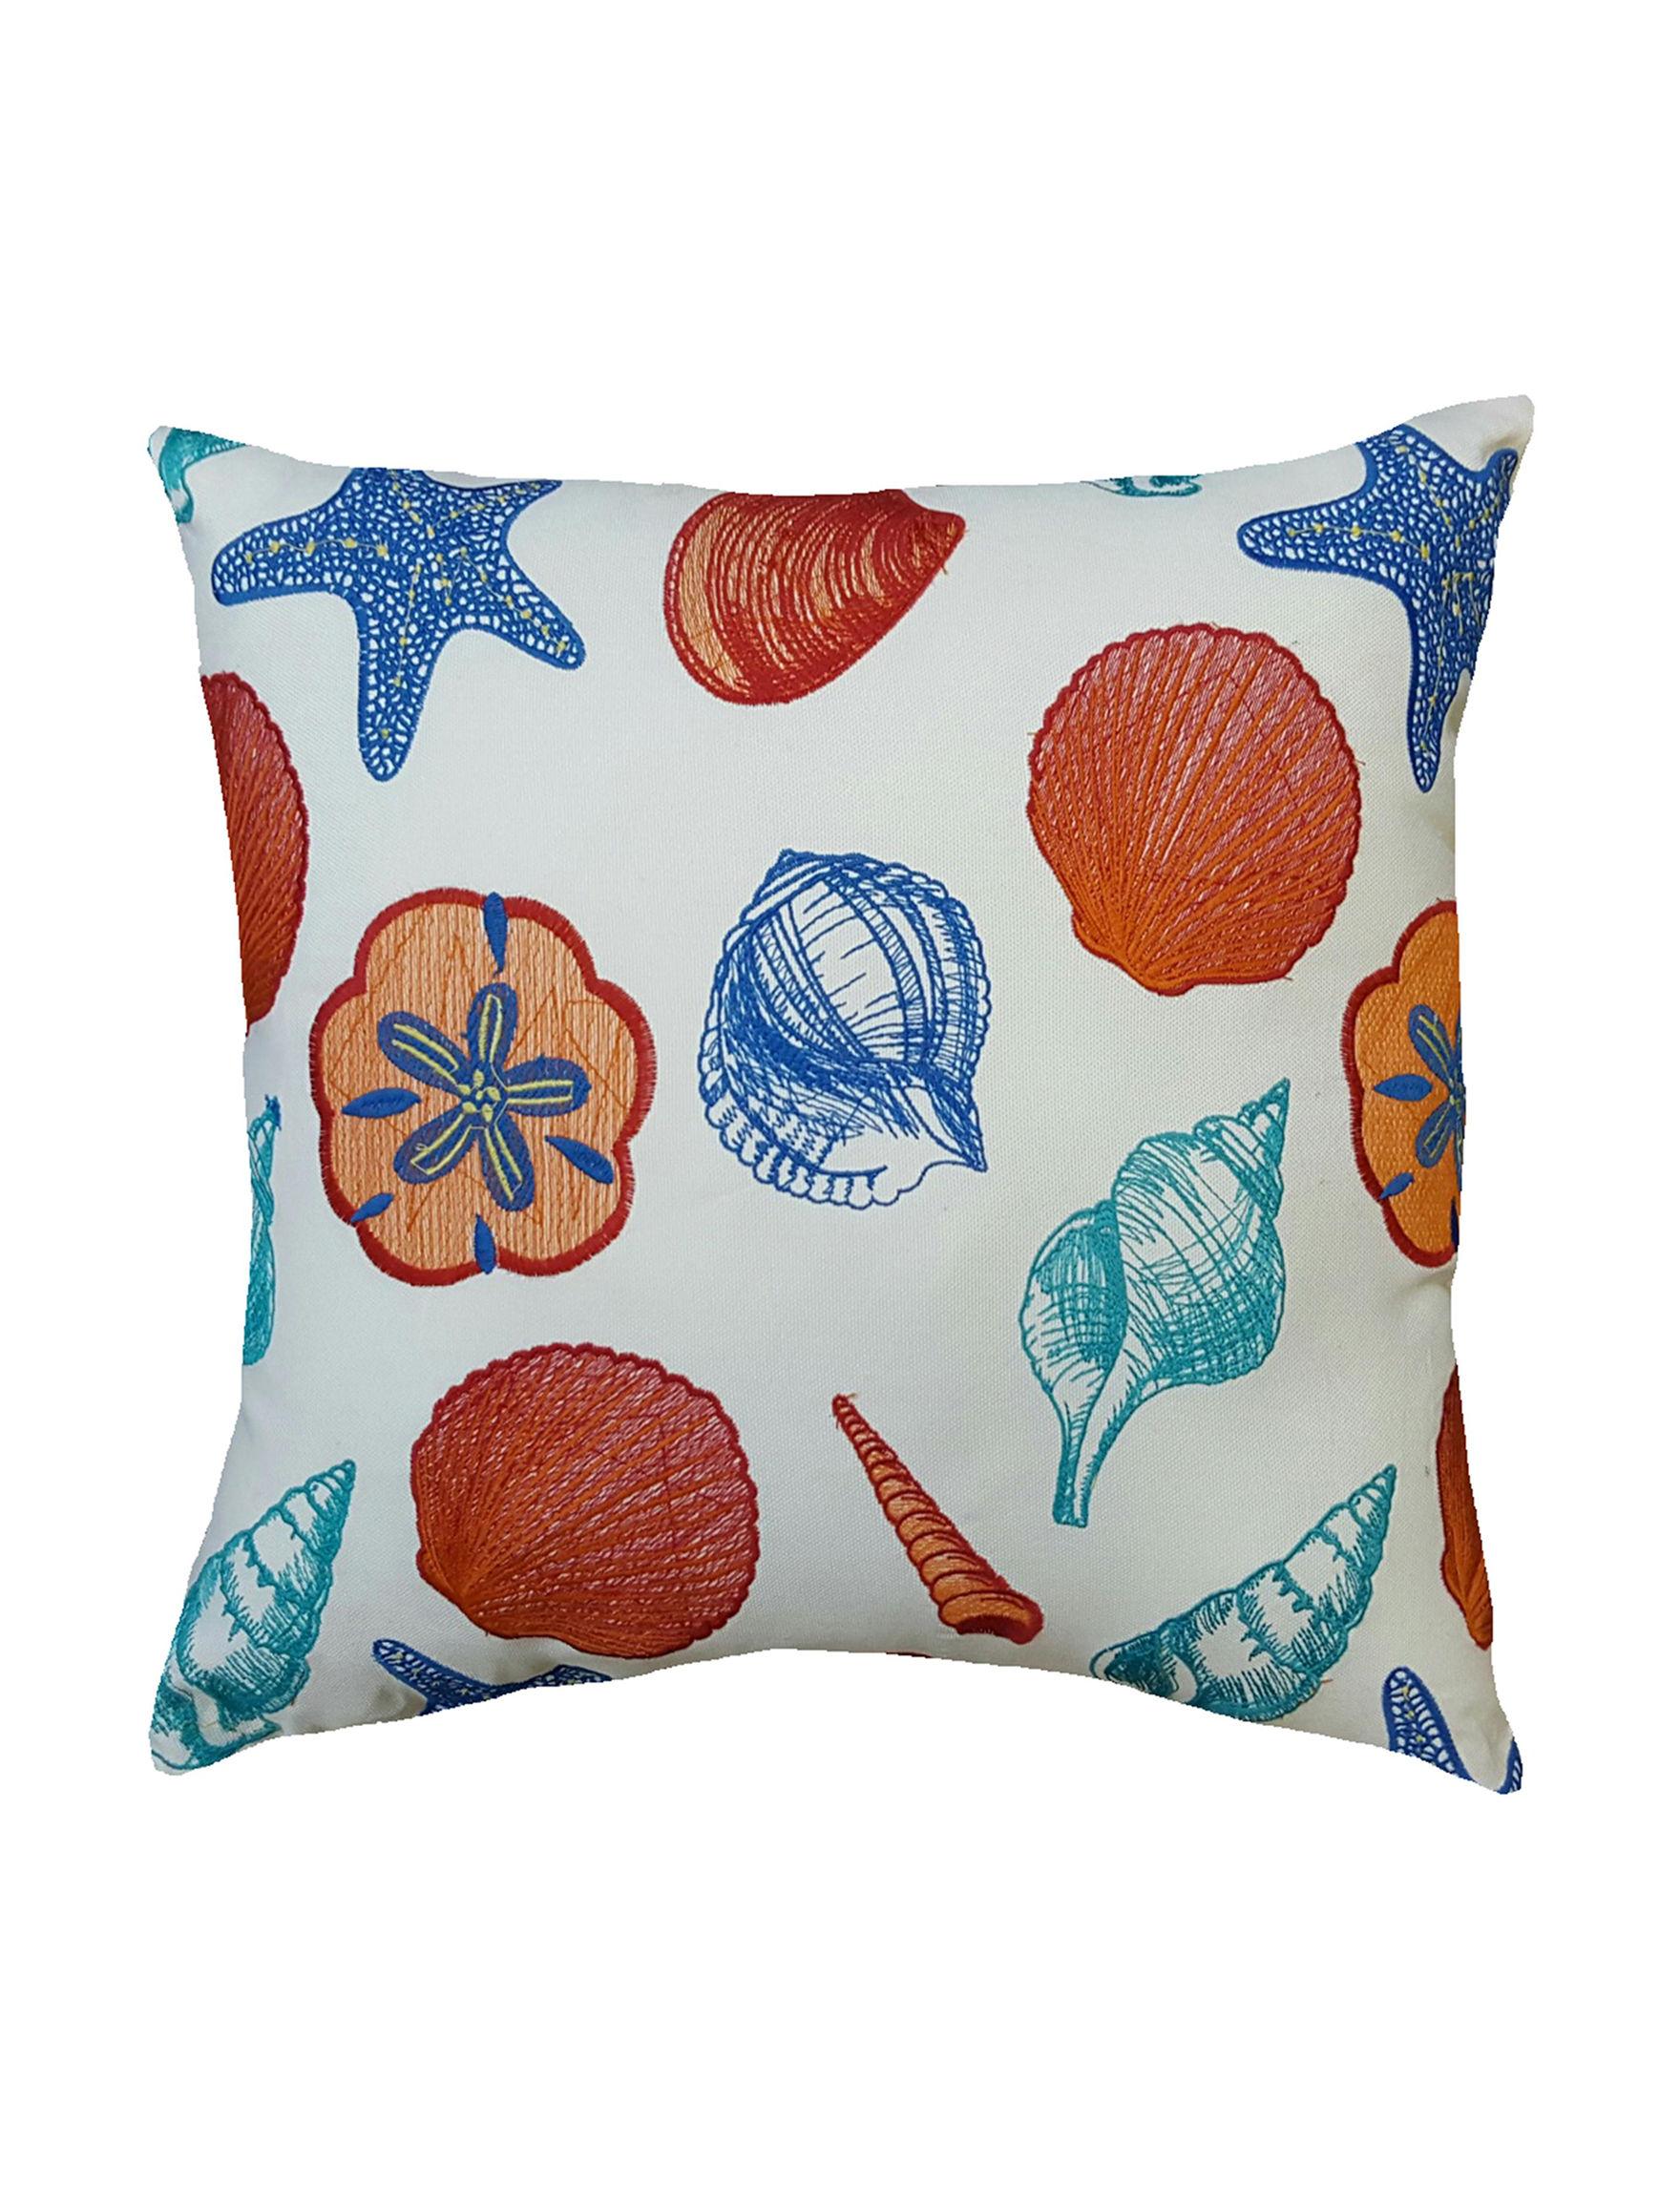 Home Fashions International Blue Multi Decorative Pillows Outdoor Decor